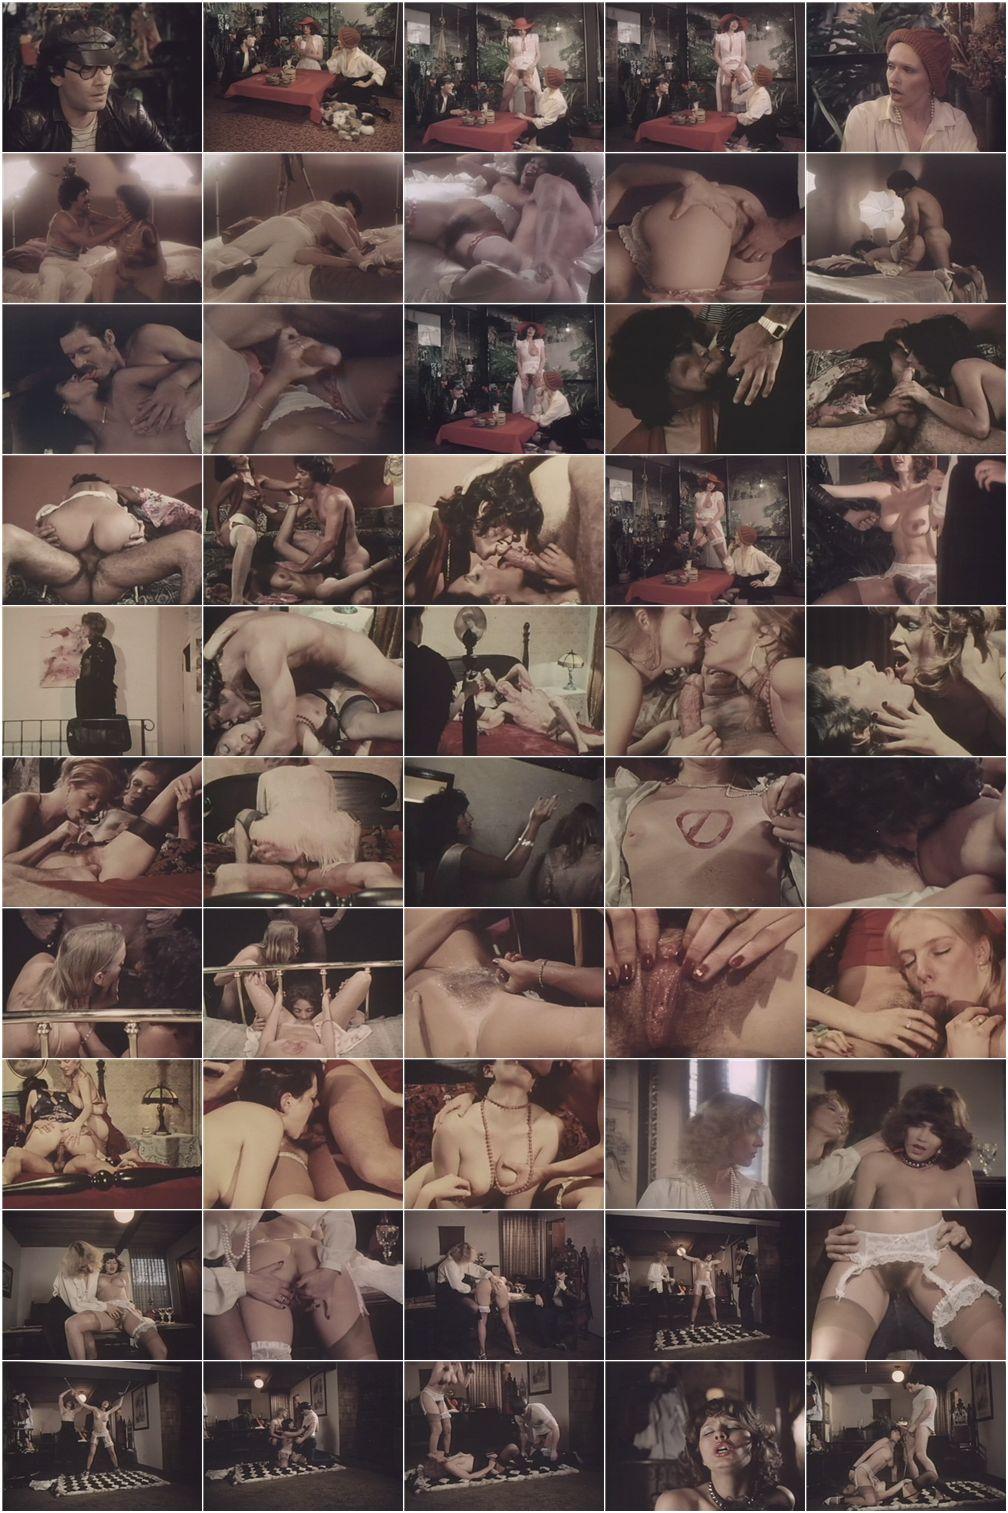 porno-film-1980-h